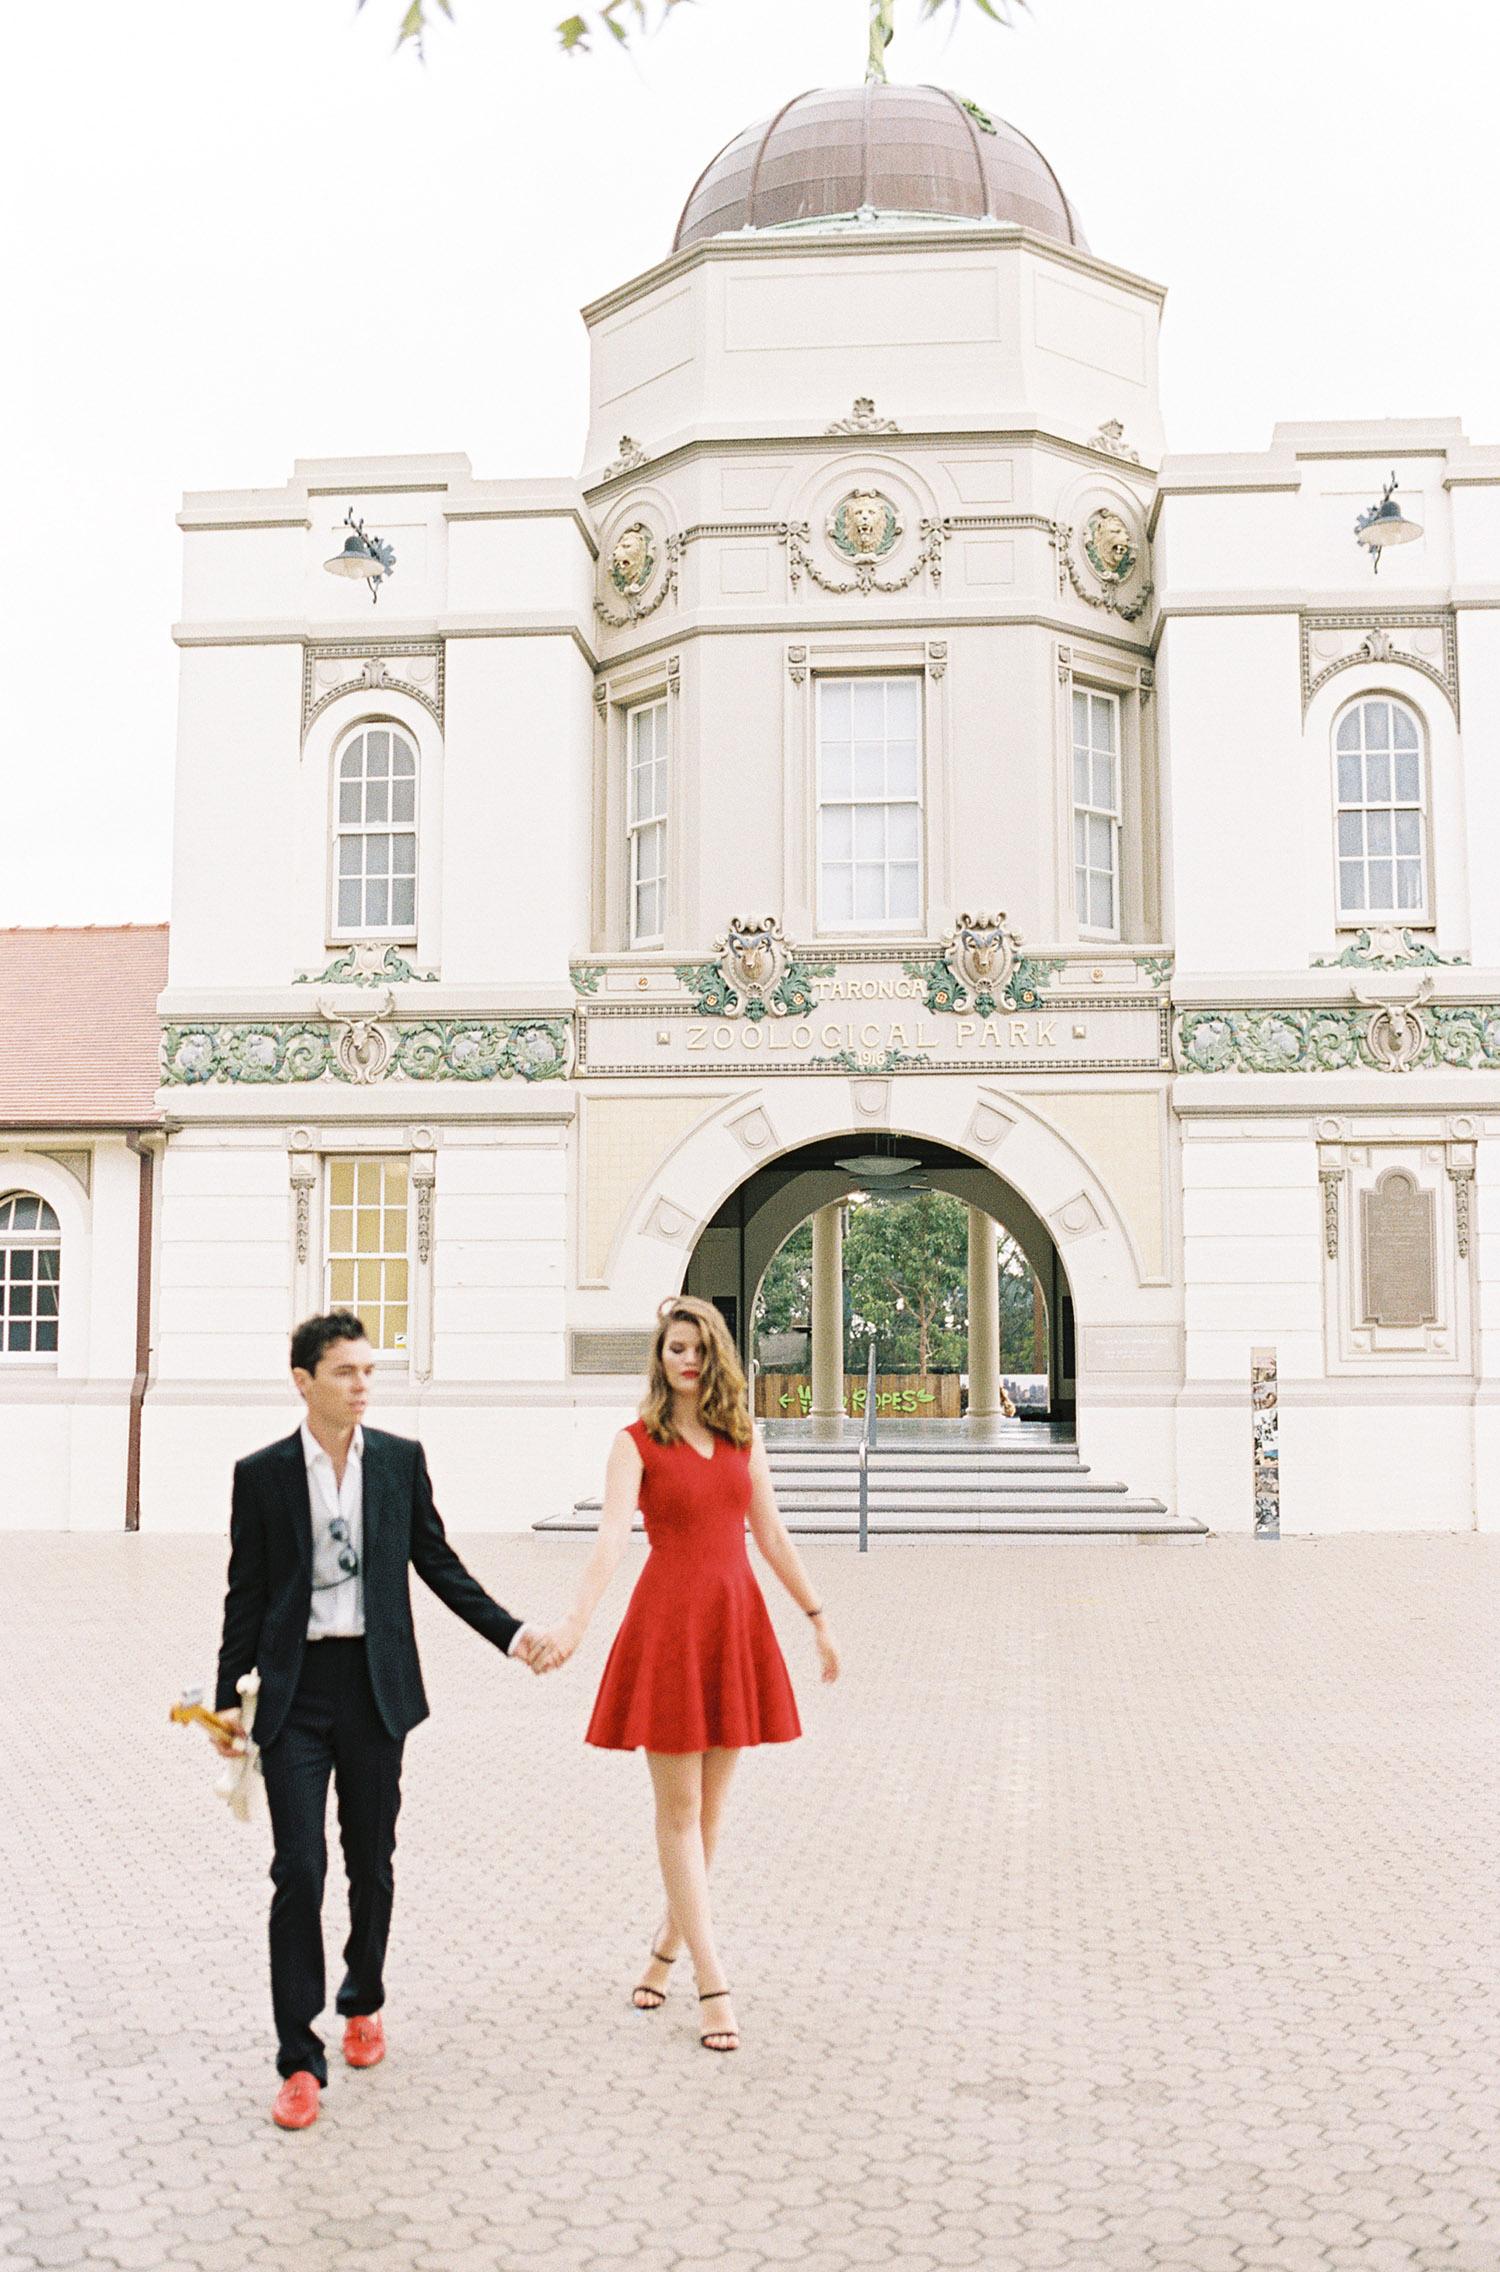 The Wedding Series Love Stories Emma Birdsall Dan May 3